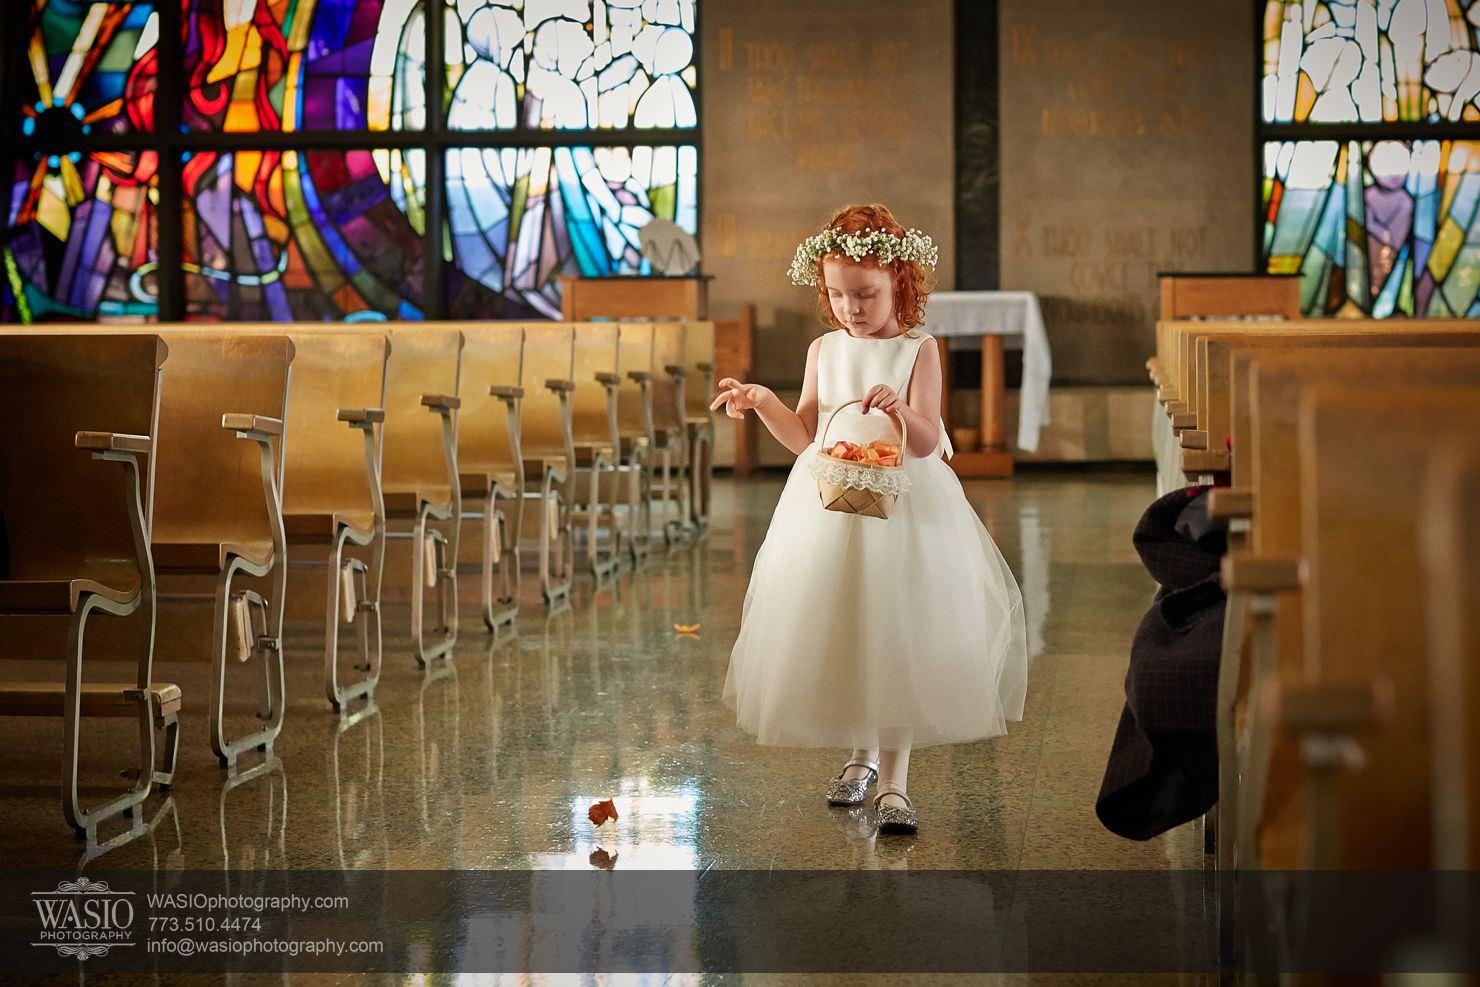 Rosemont-Fall-Wedding-Lauren-and-David-011 Rosemont Fall Wedding - Lauren + David